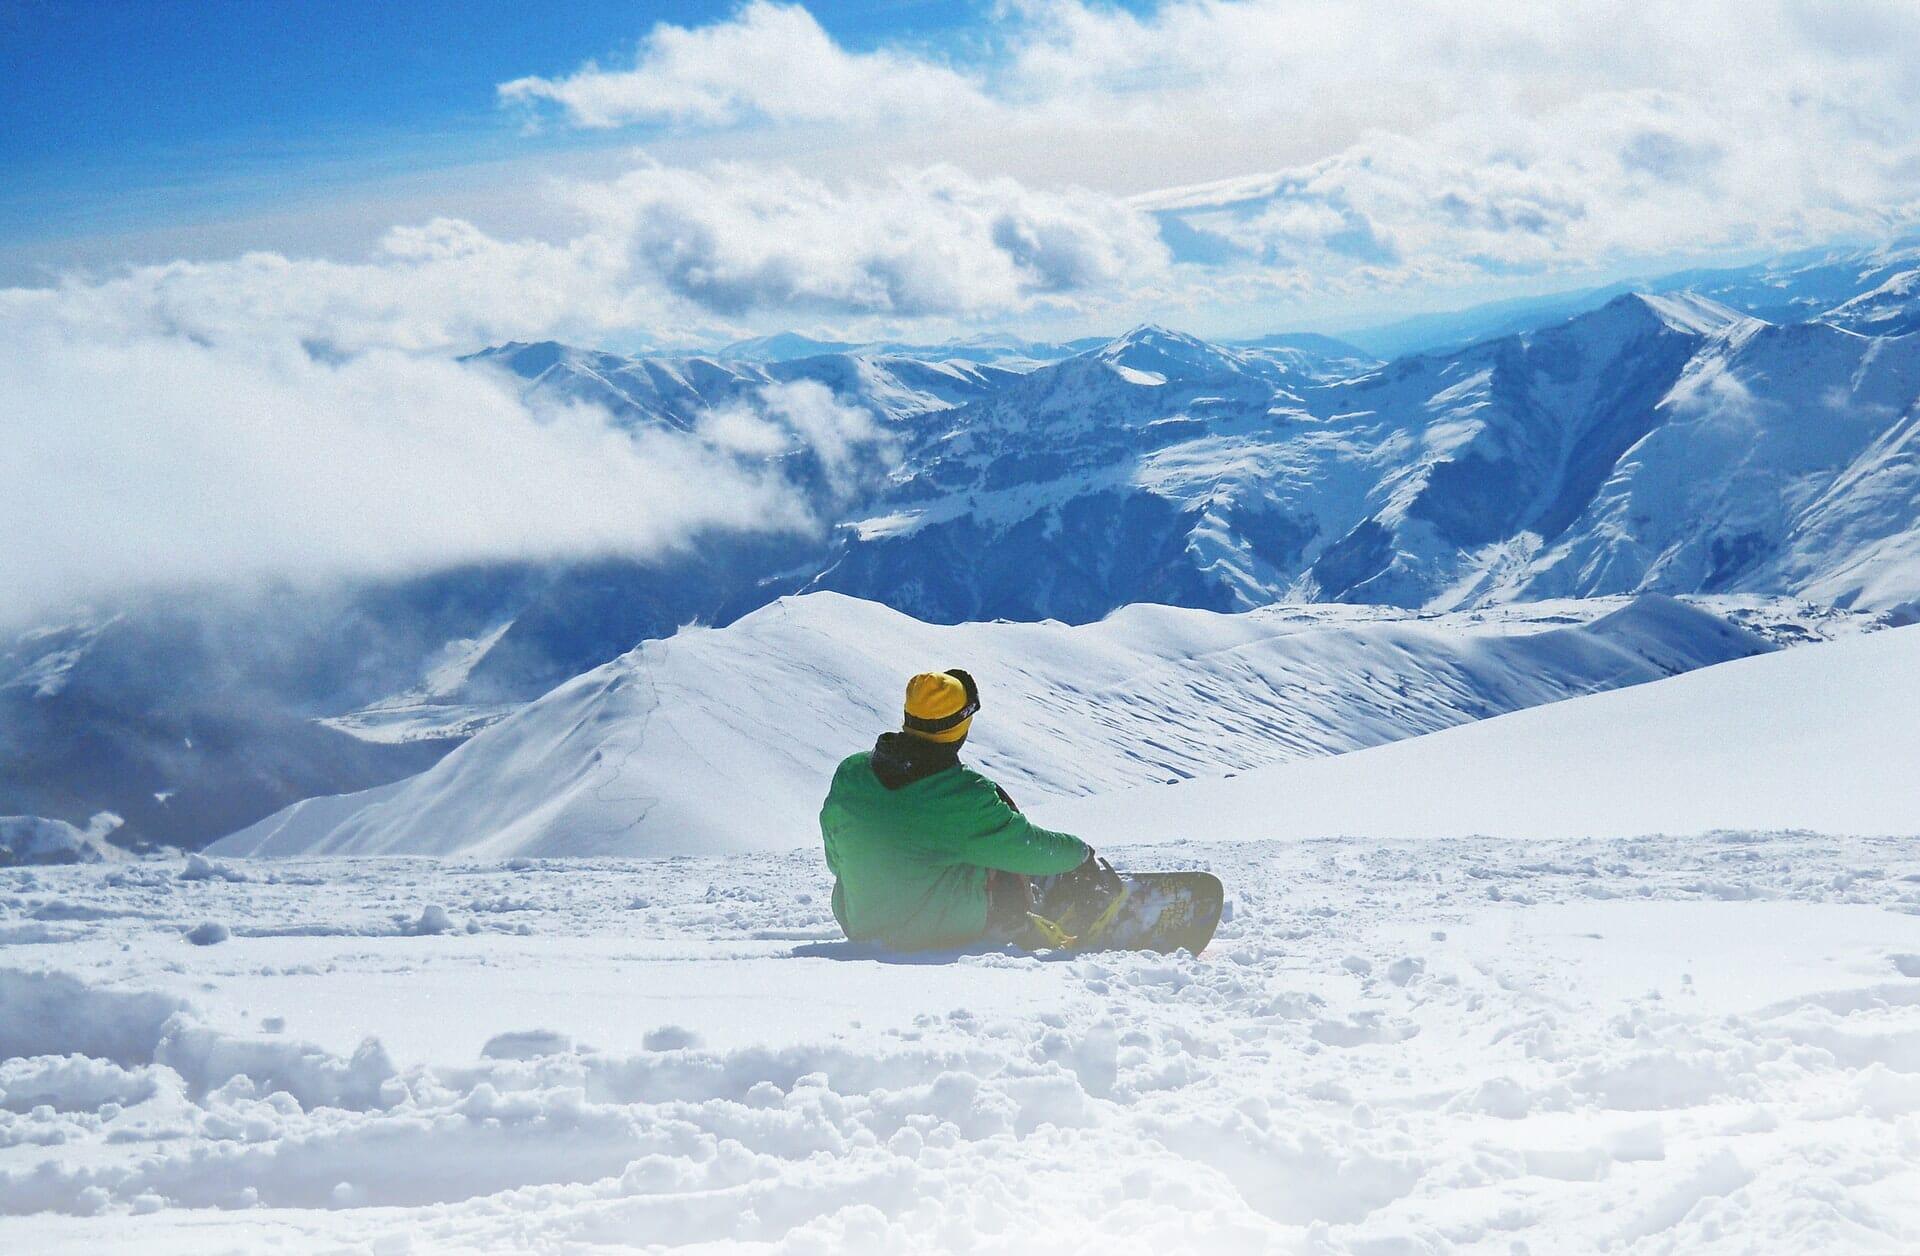 bucket list hiver - snowboard